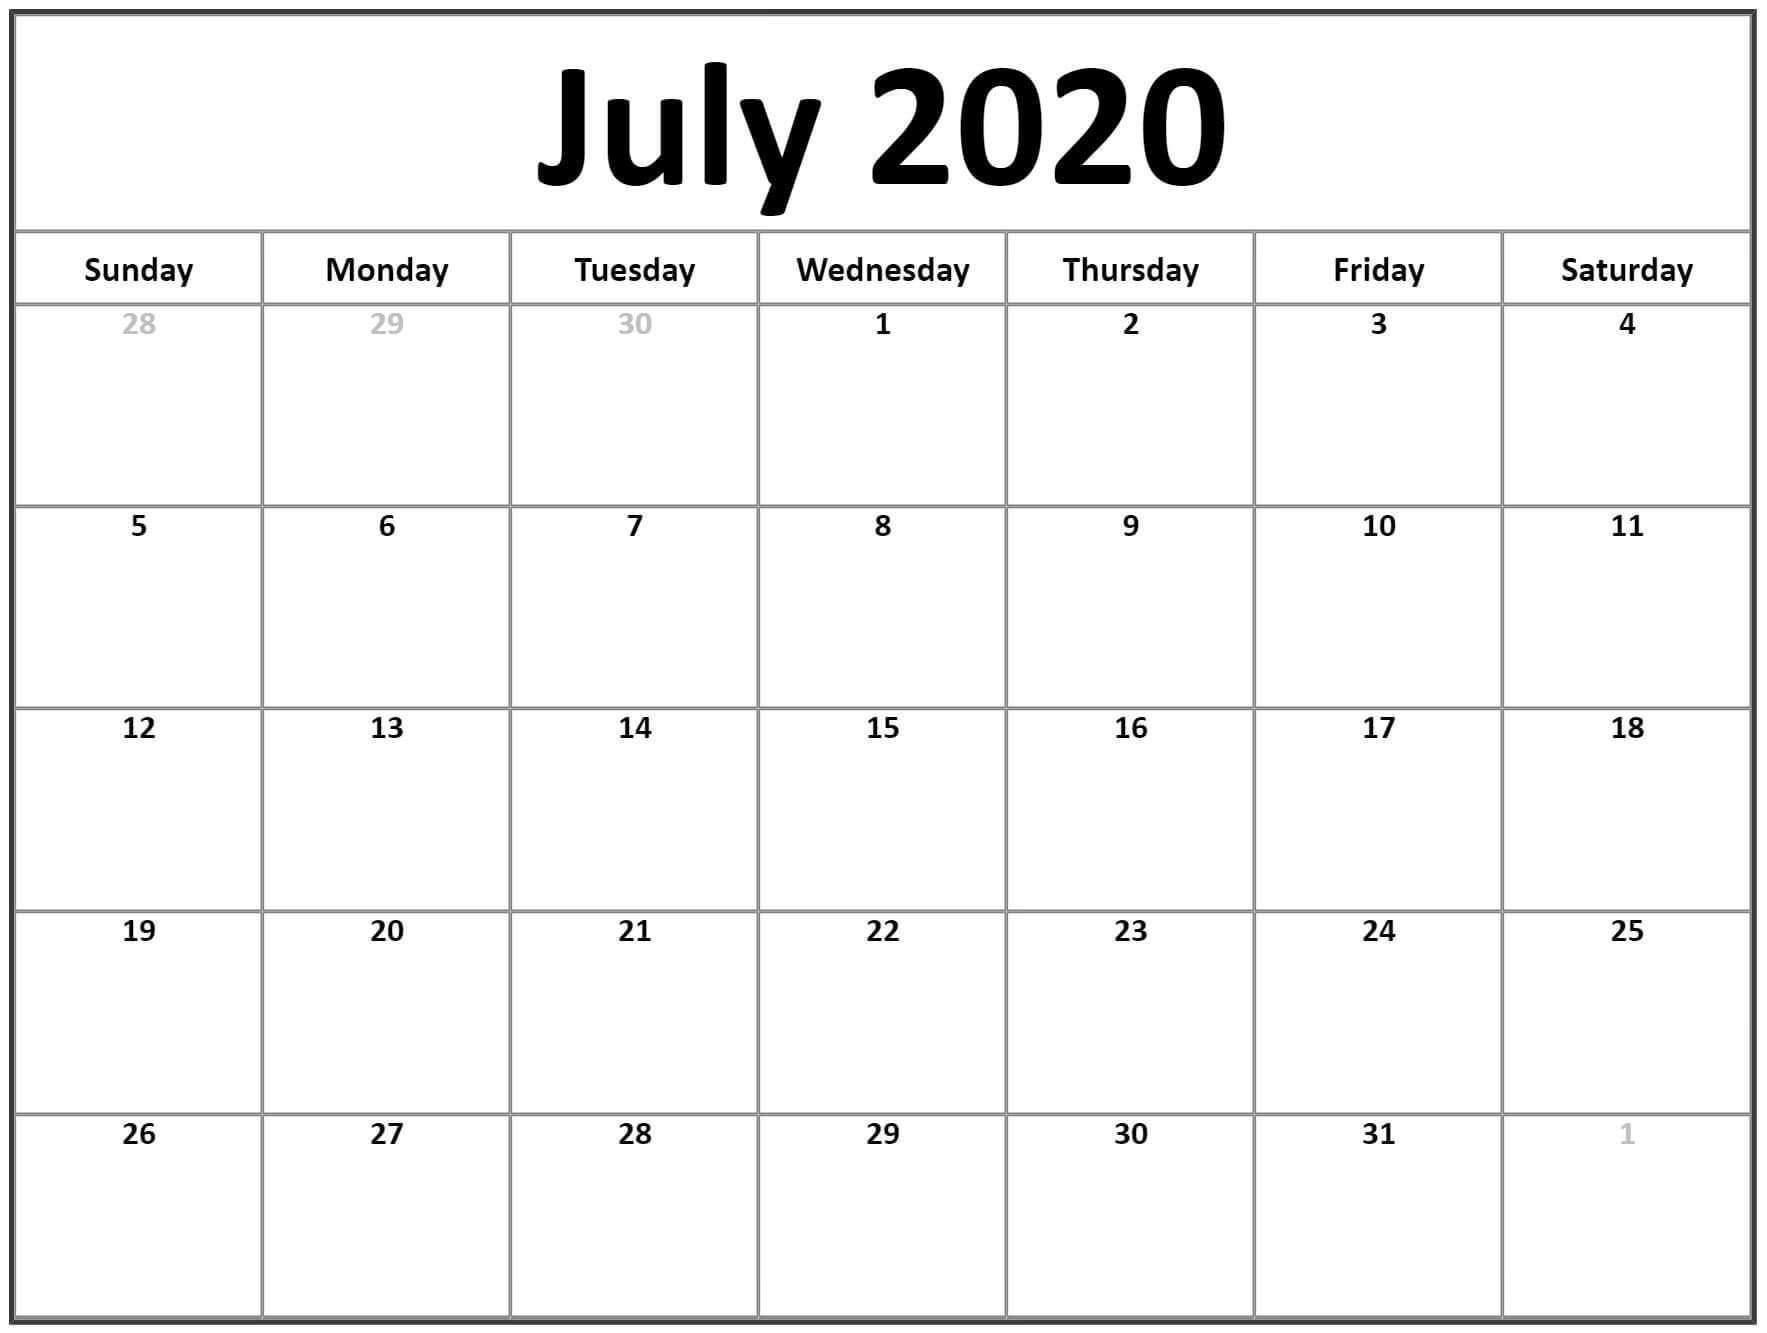 Cute July 2020 Calendar With Holidays